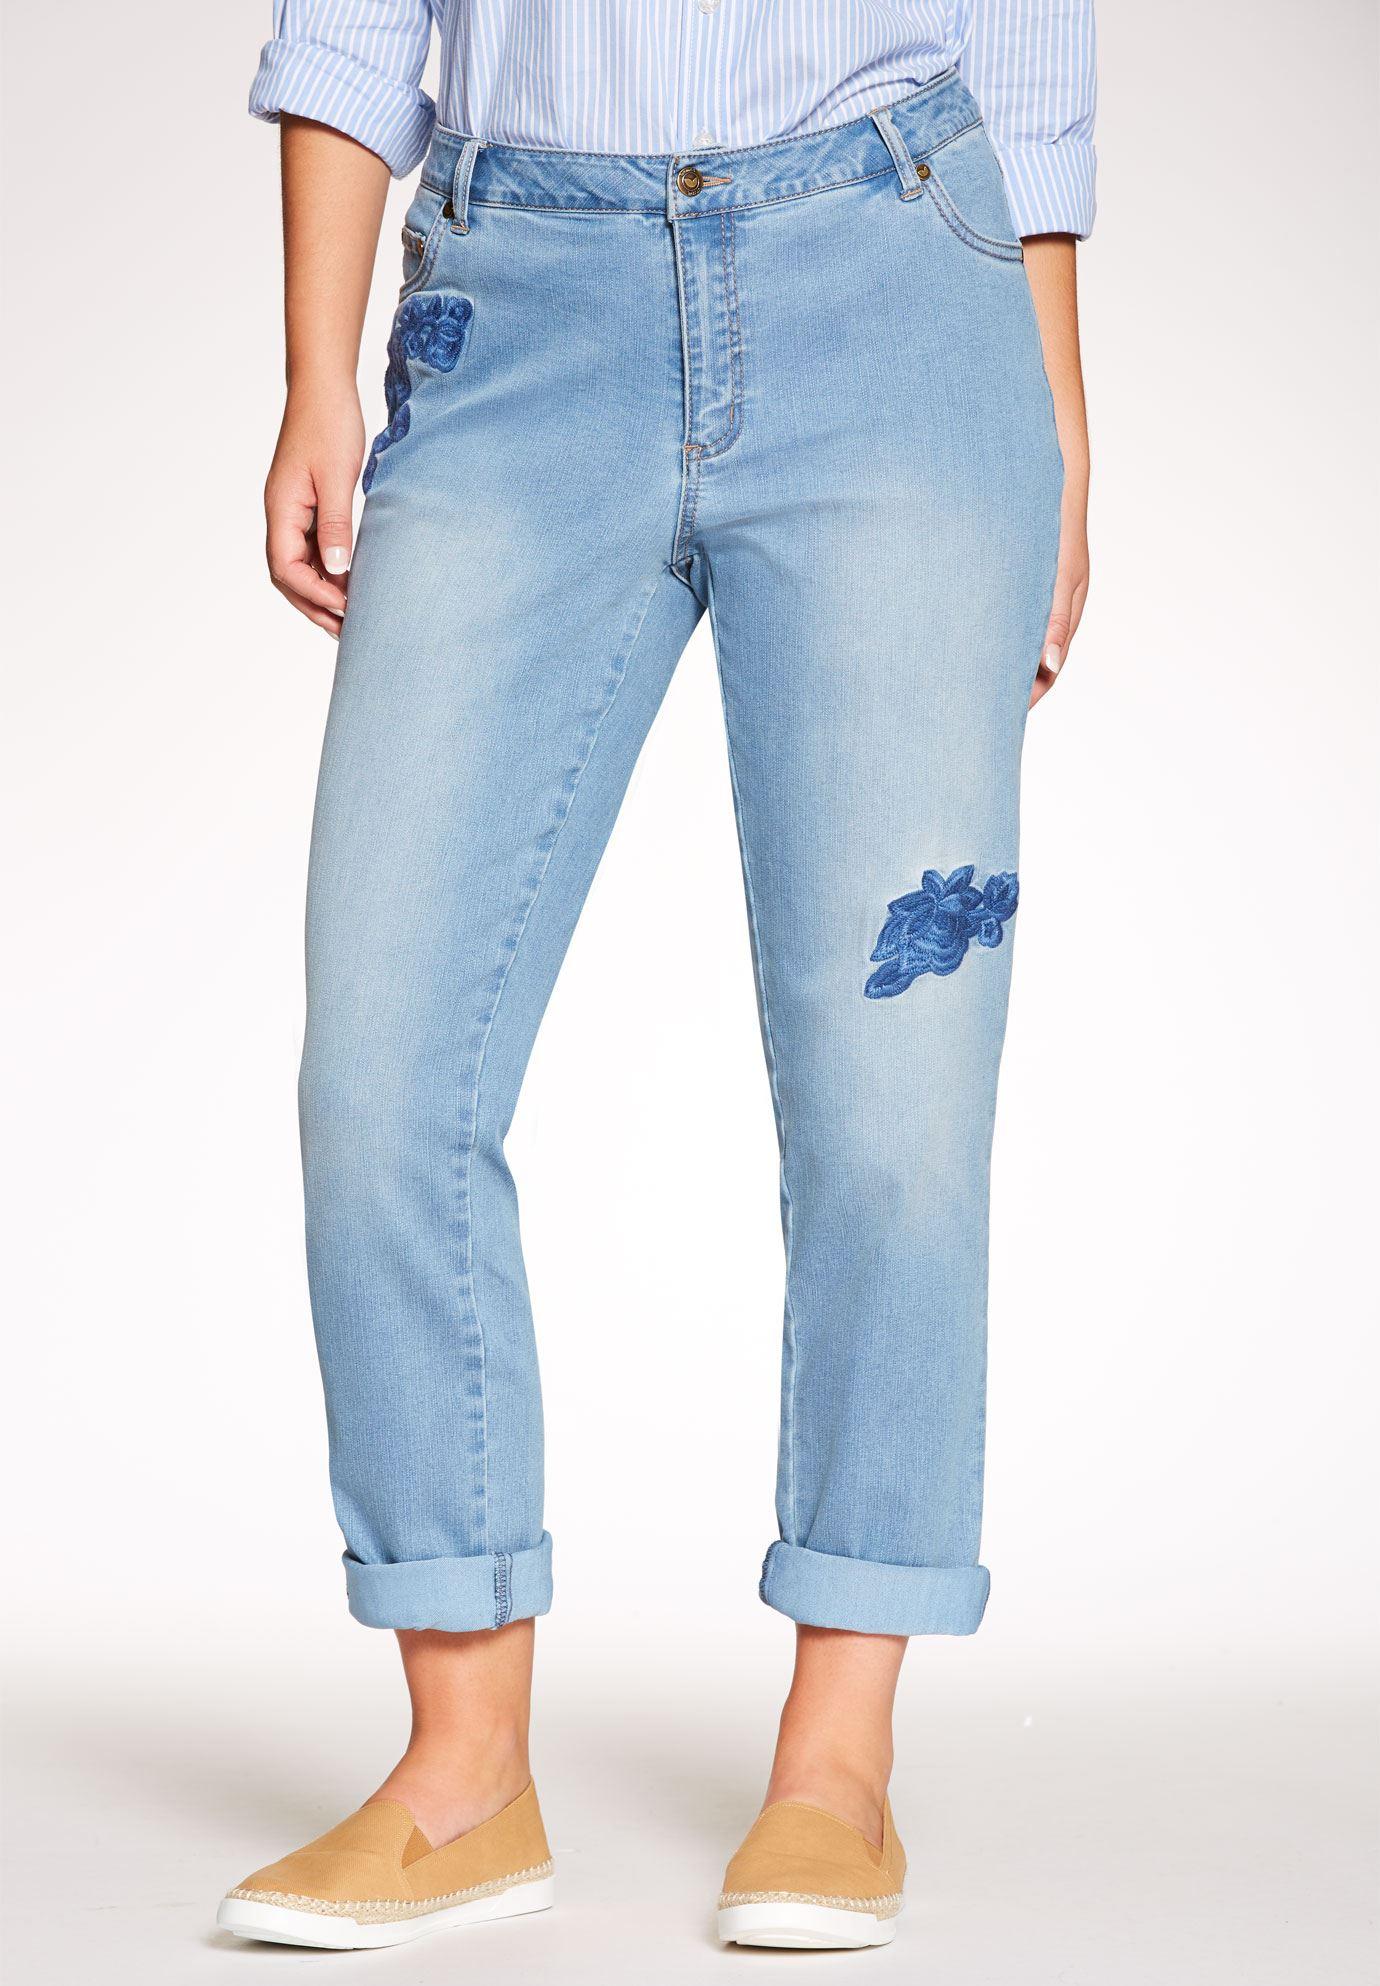 plus size jeans straight leg stretch jean KKRWLES